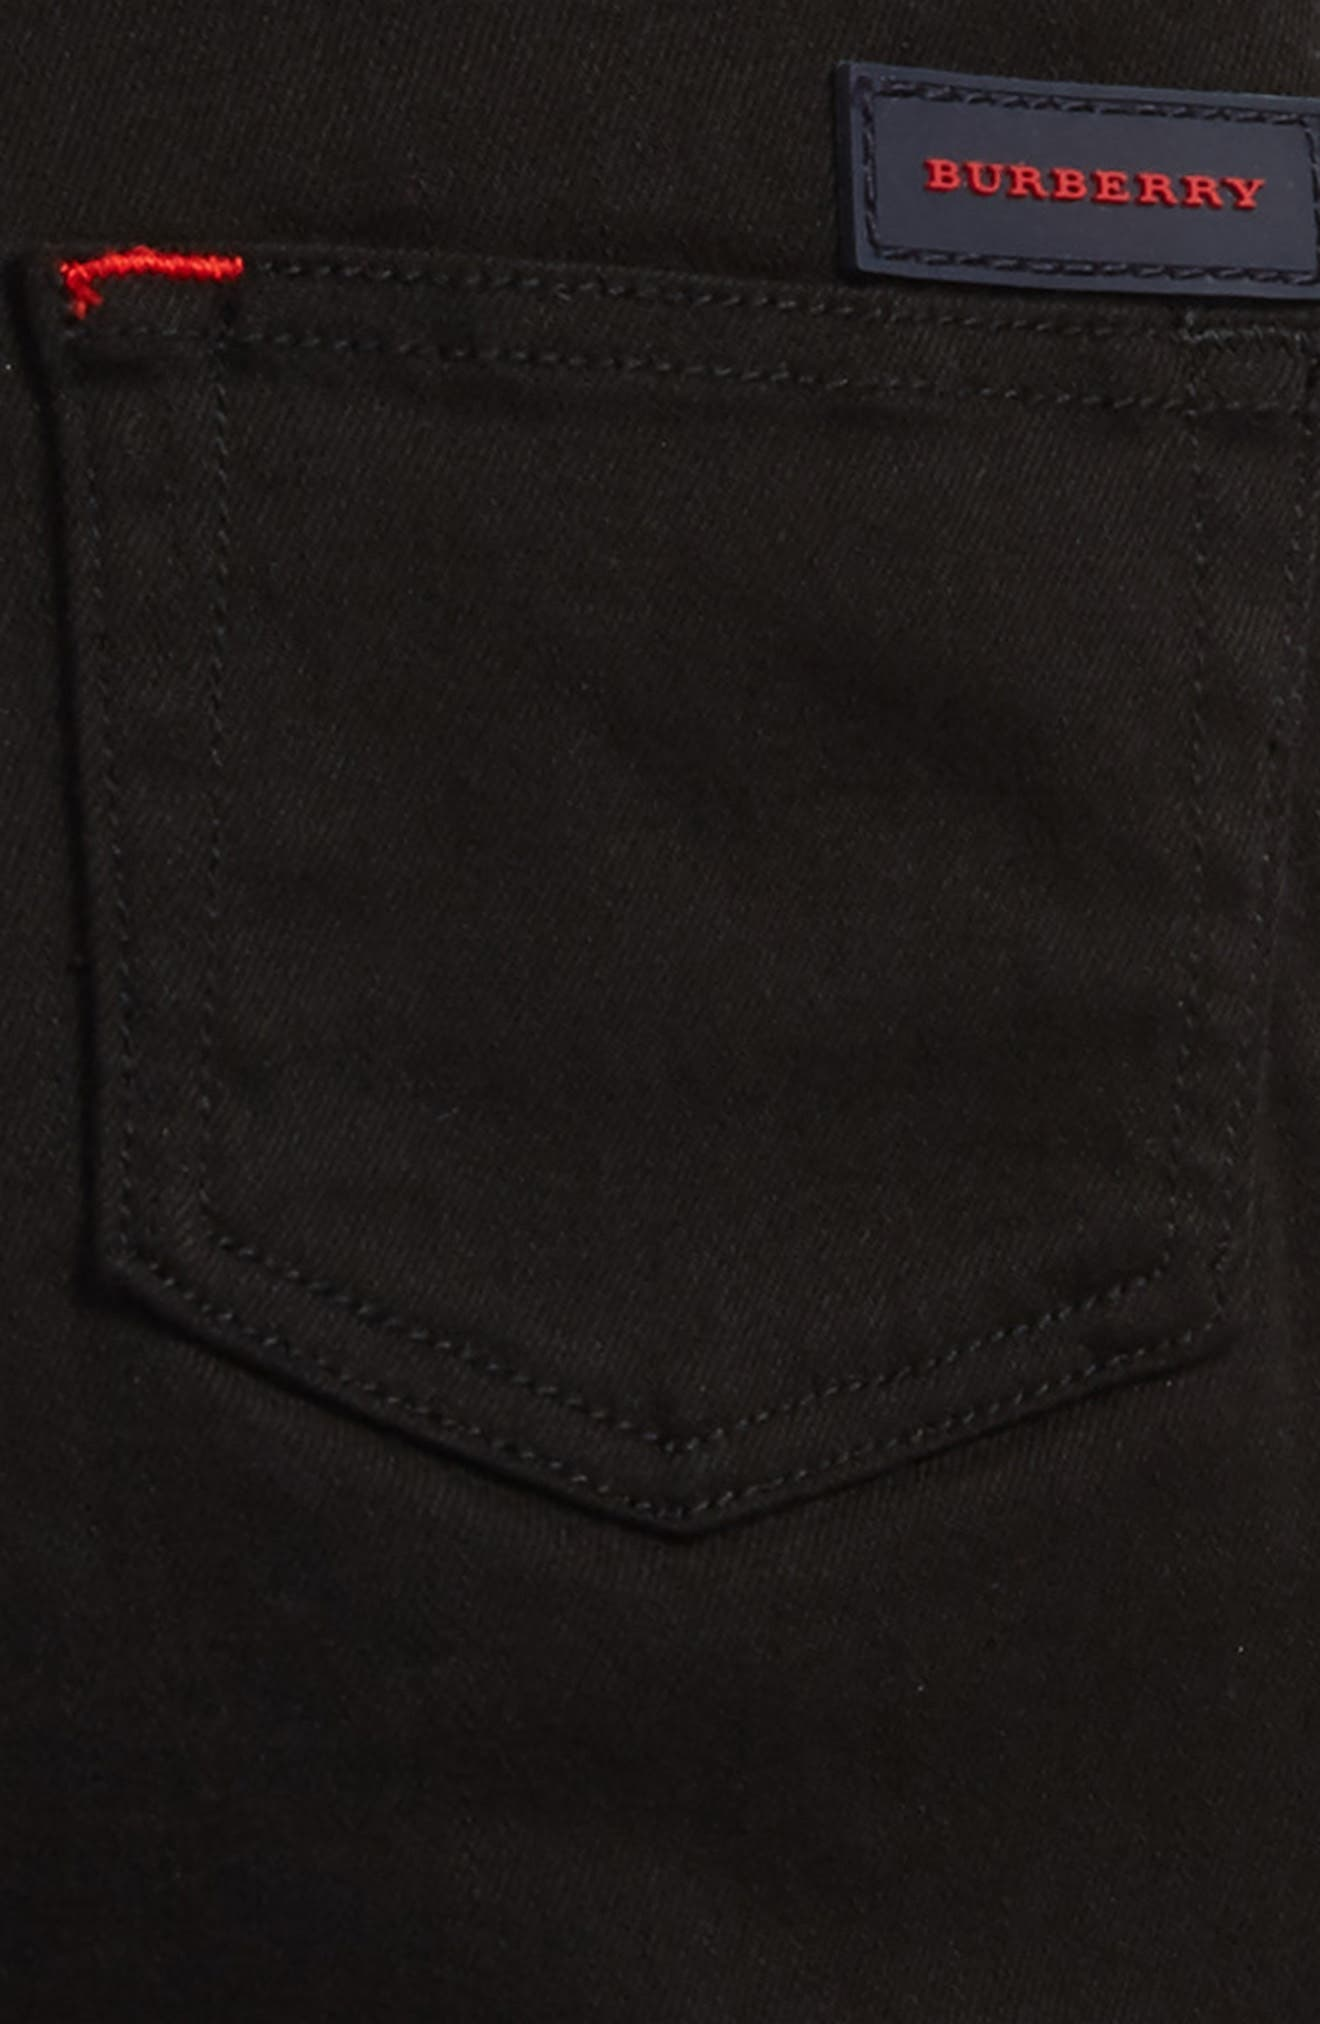 Alternate Image 3  - Burberry Skinny Jeans (Toddler Boys, Little Boys & Big Boys)